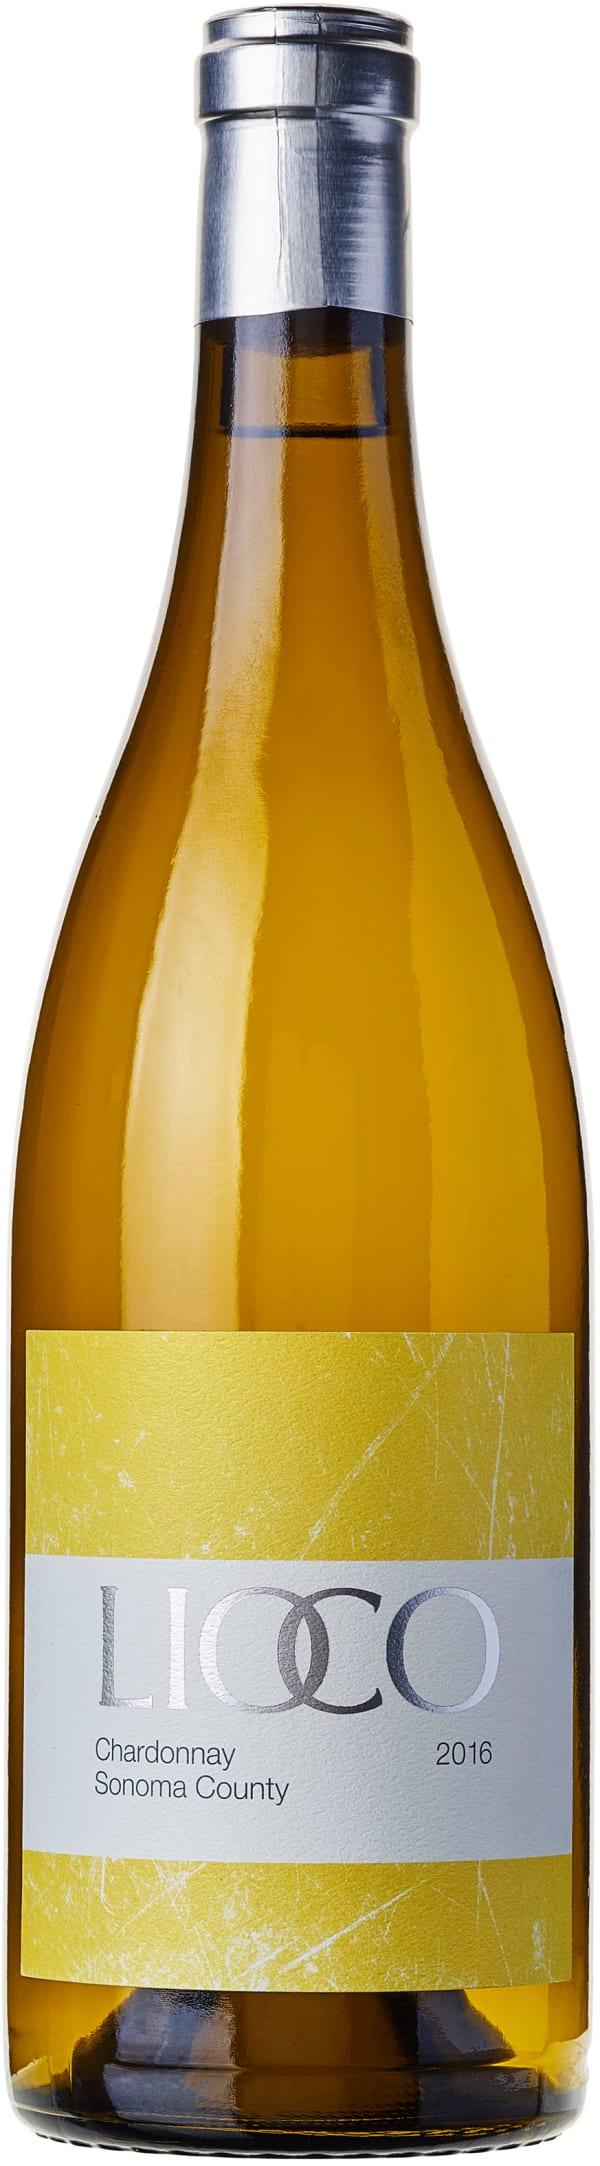 Lioco Chardonnay 2016